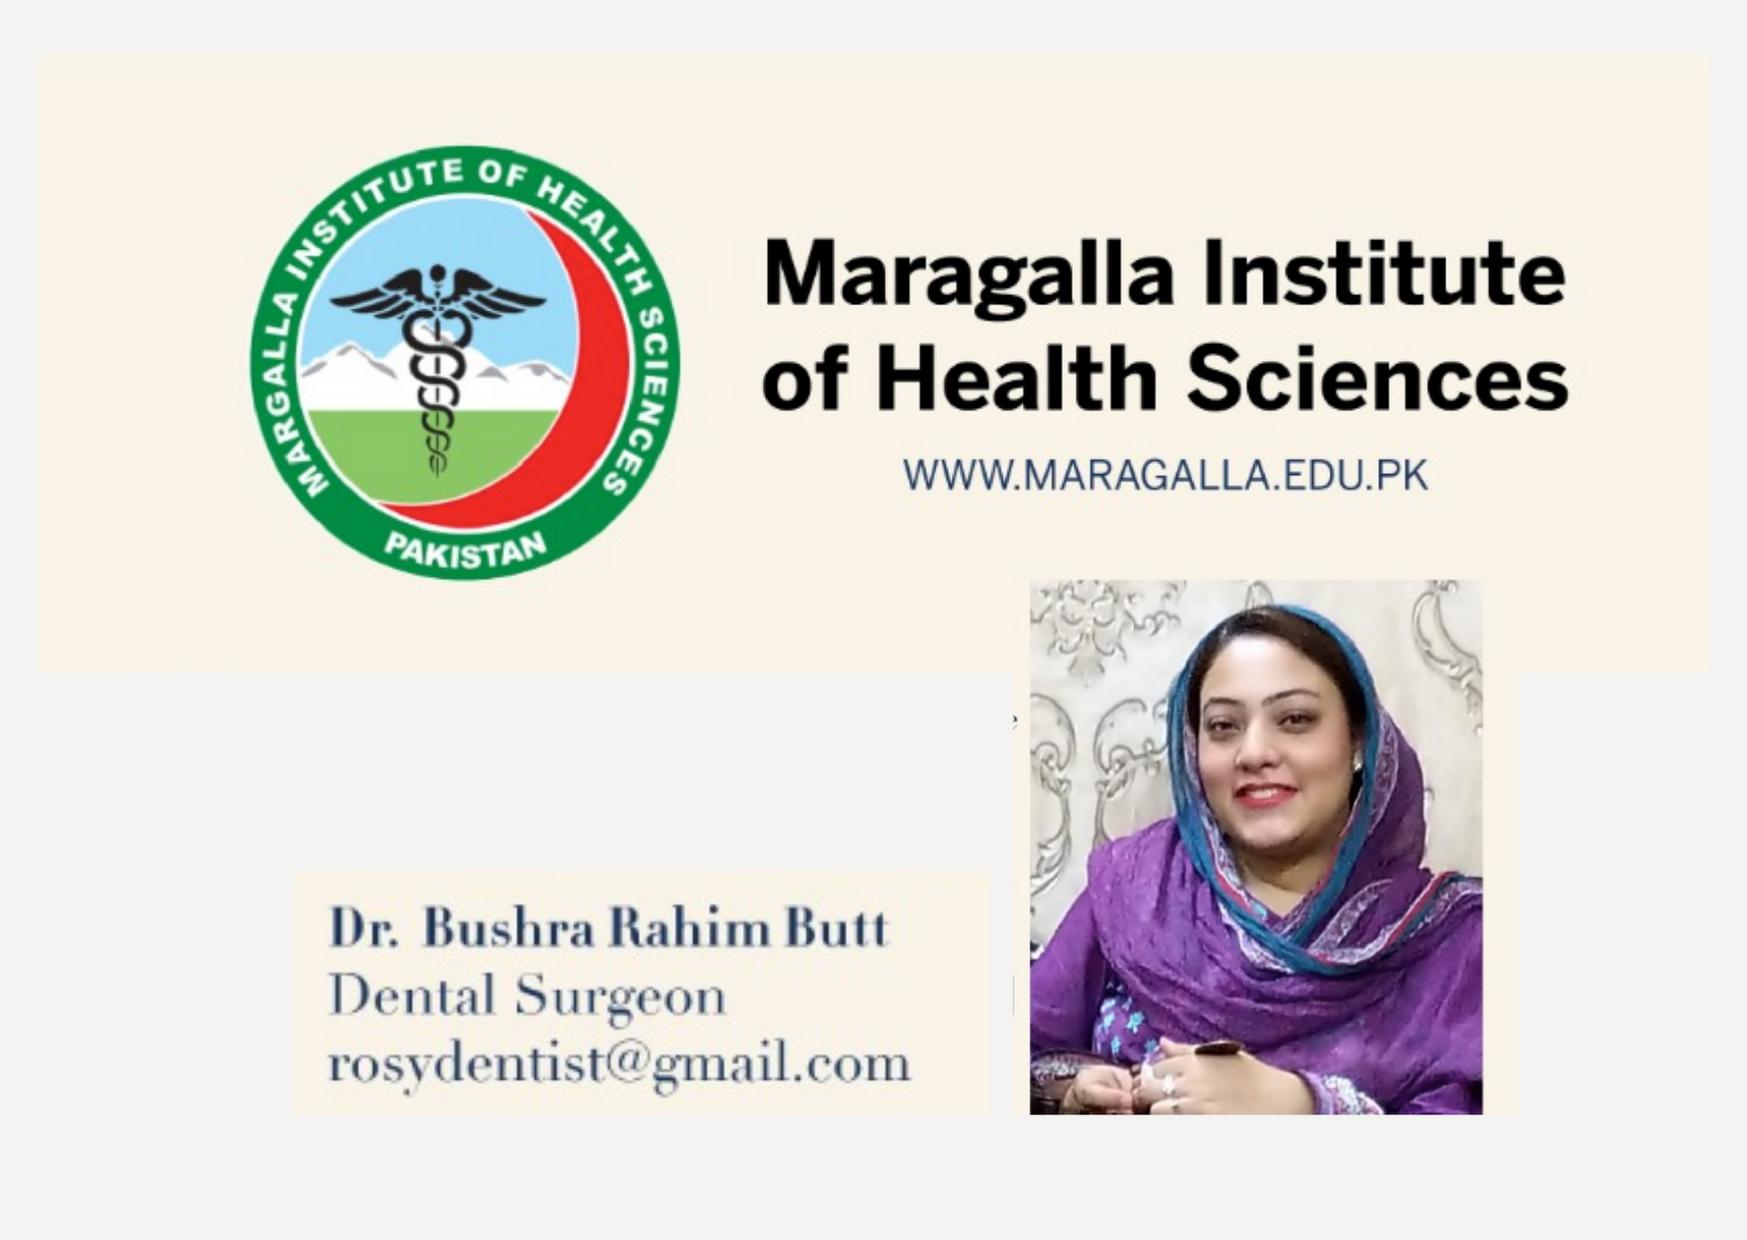 Dr. Bushra Rahim Butt about MIHS